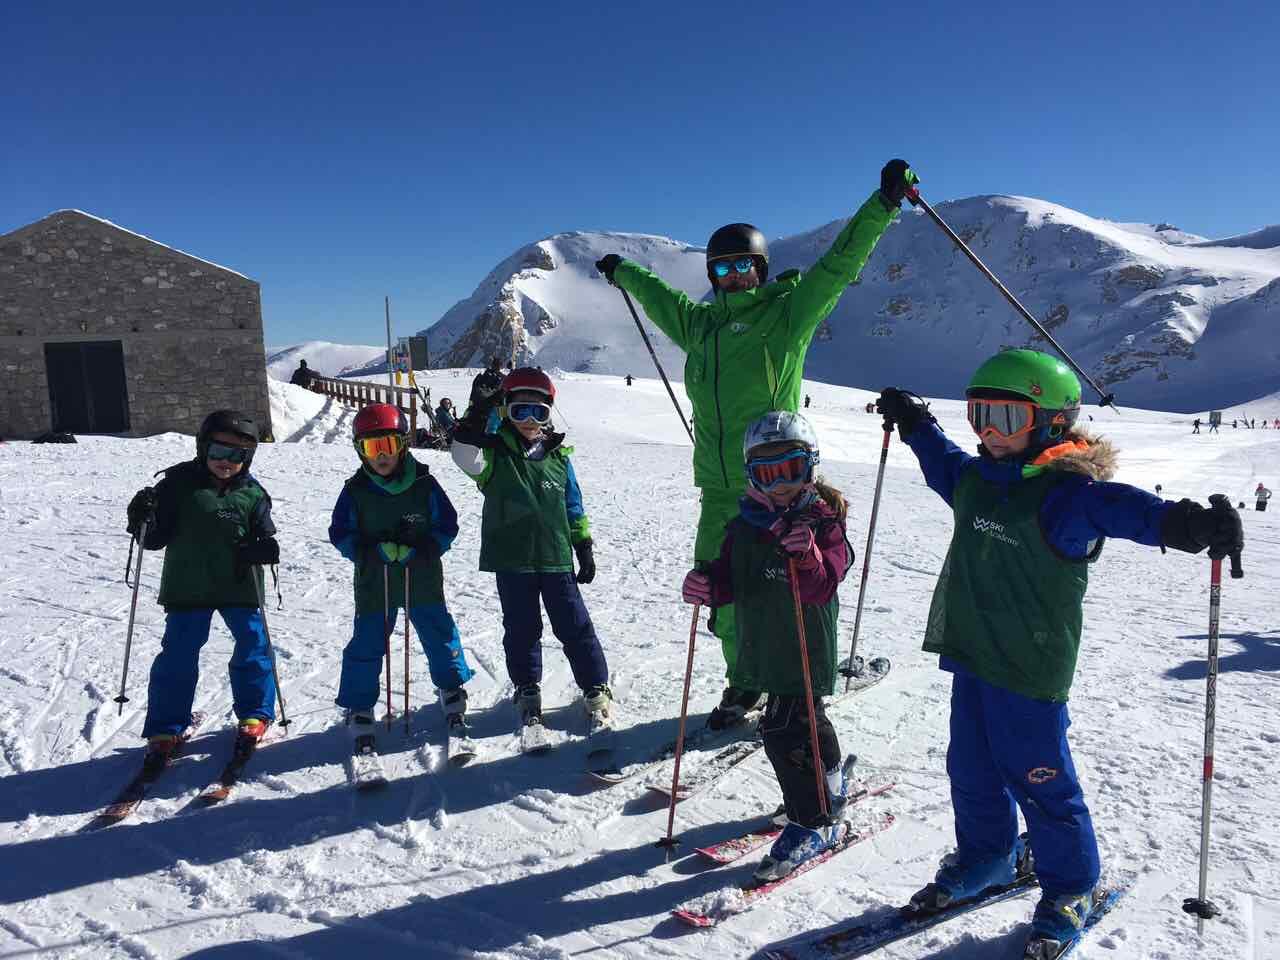 95387c357c0 Τα τμήματά μας - Πρόγραμμα Ακαδημίας Σκι | Snowport